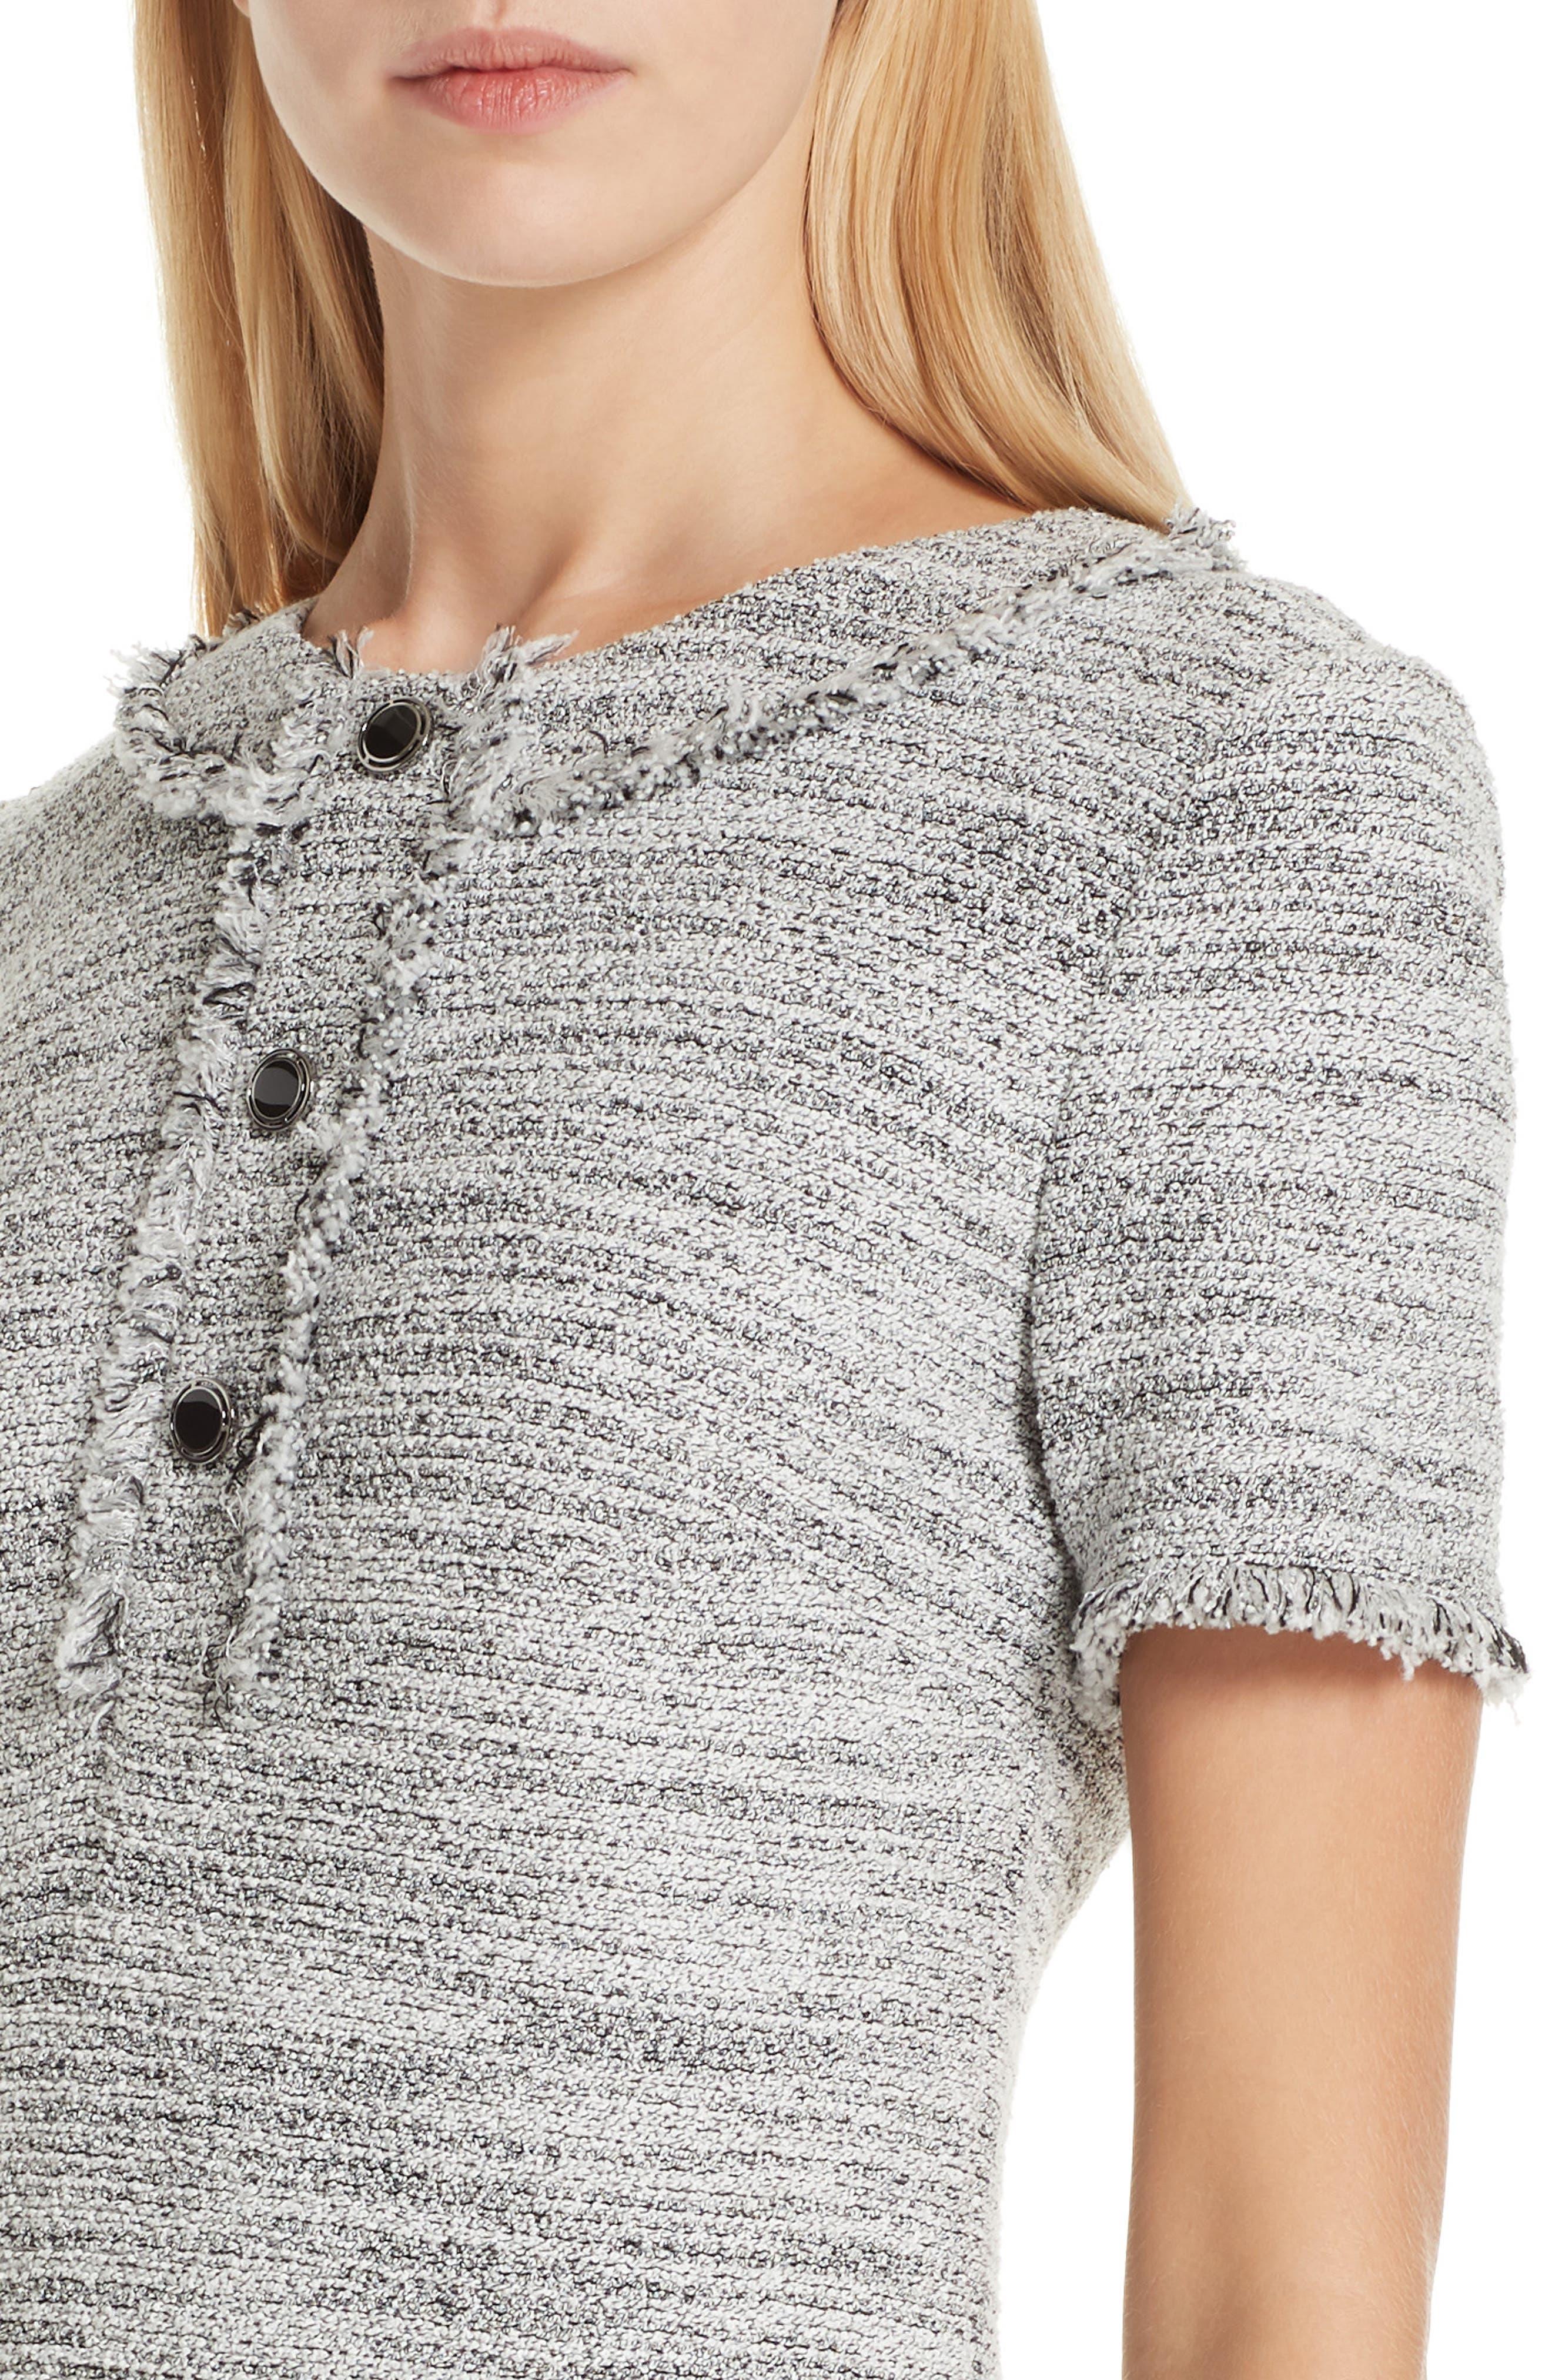 ST. JOHN COLLECTION, Eaton Place Tweed Knit Dress, Alternate thumbnail 5, color, CAVIAR/ CREAM